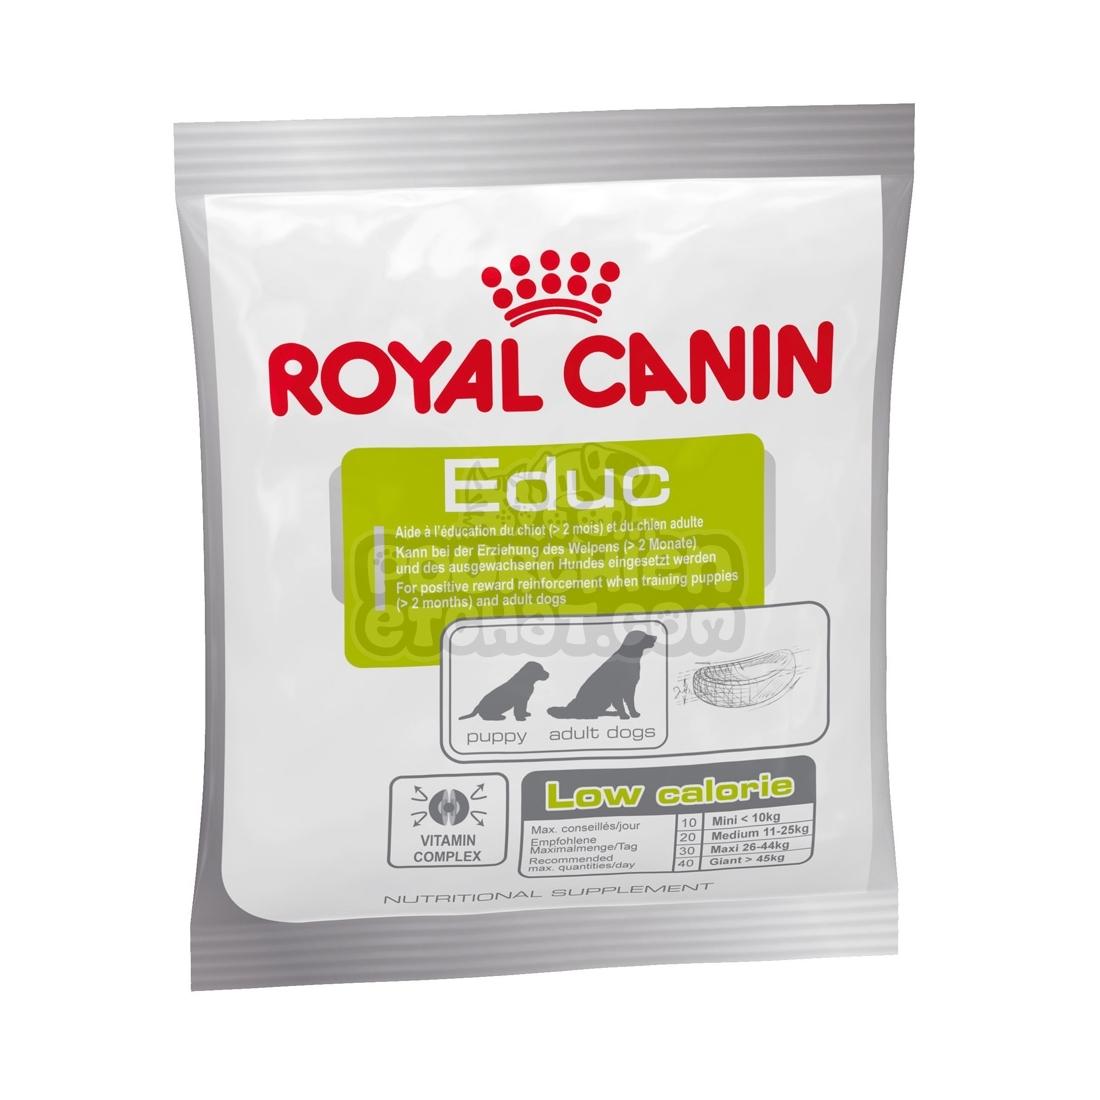 friandises pour chien royal canin educ. Black Bedroom Furniture Sets. Home Design Ideas